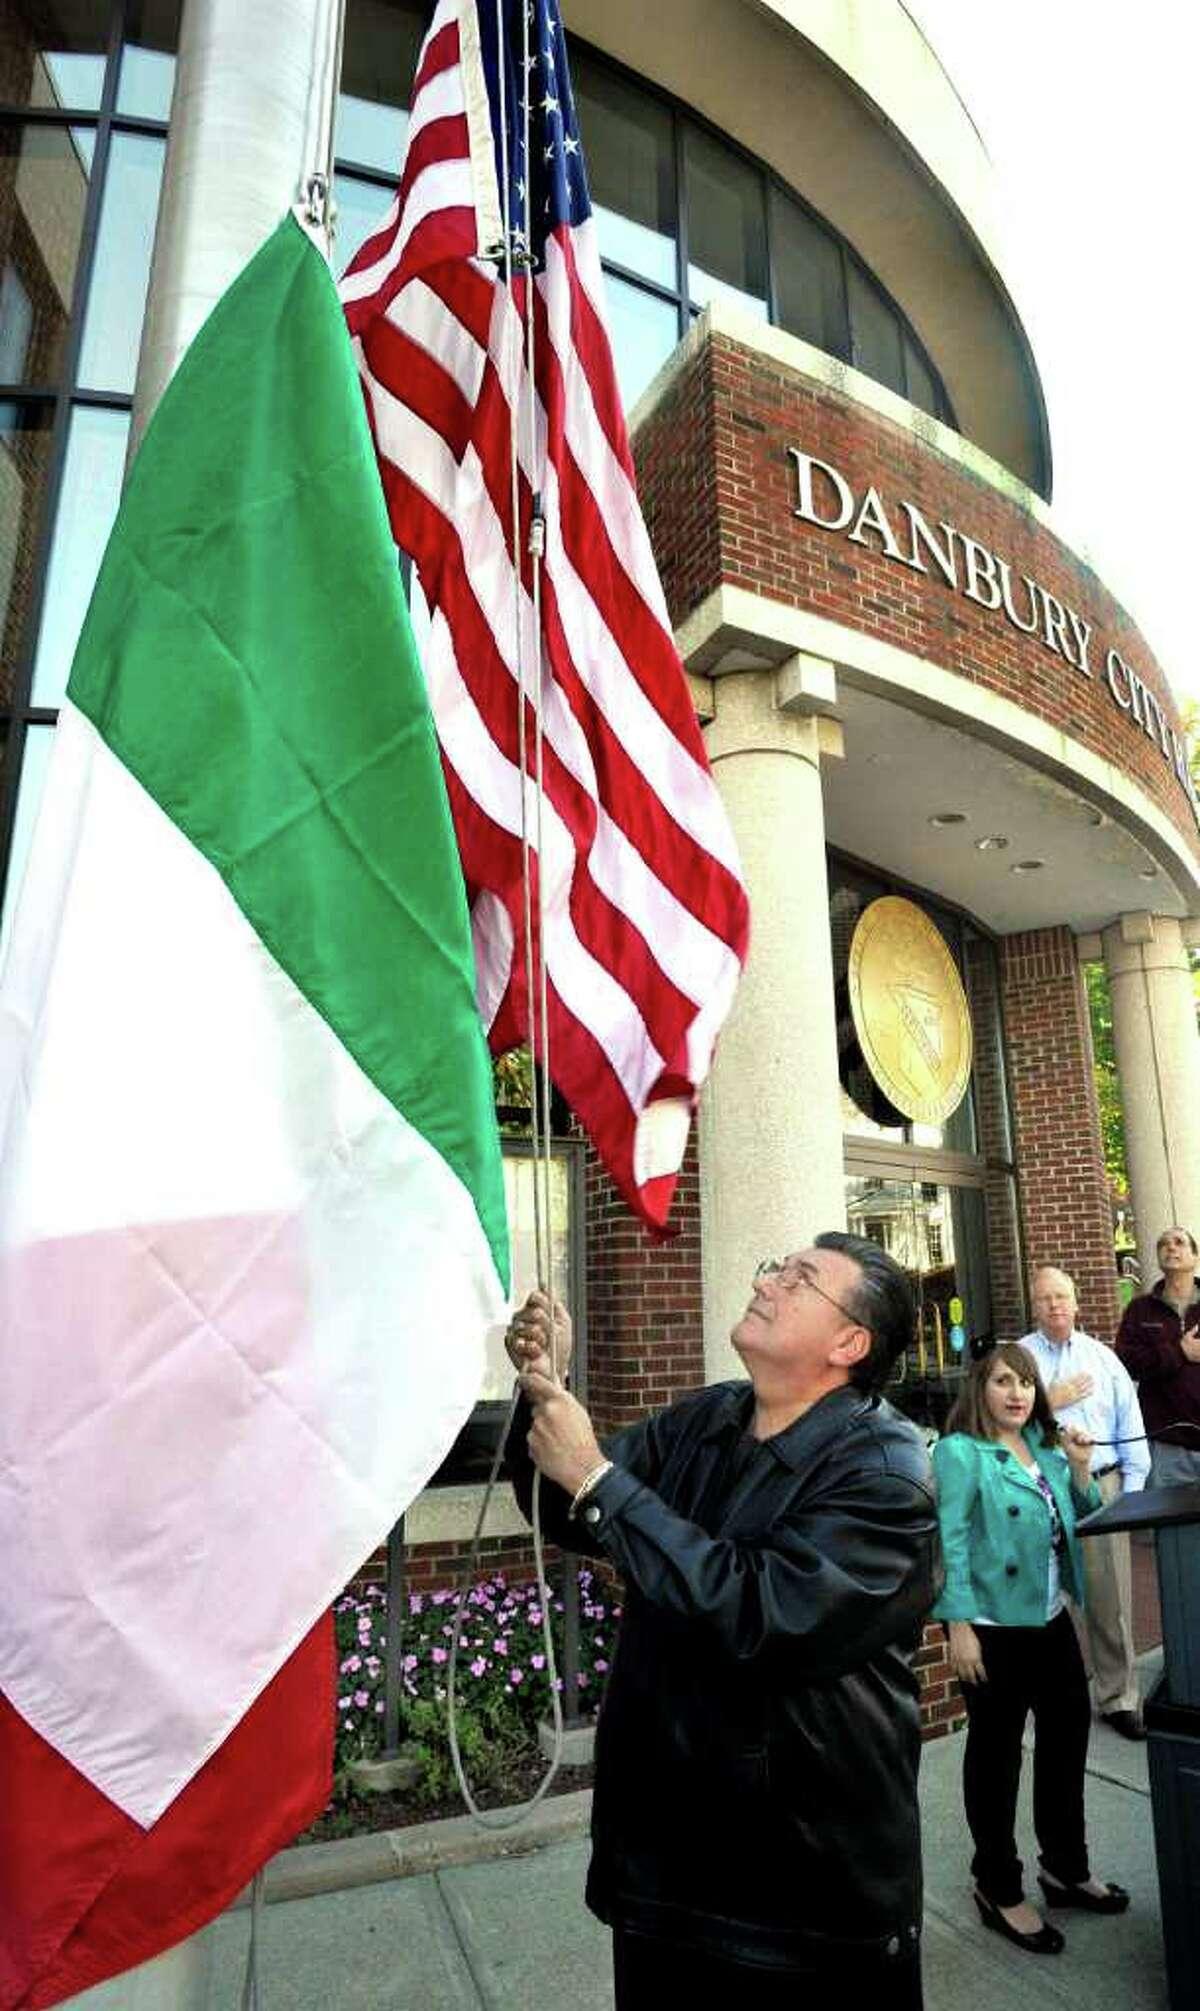 Tom Guadagno, president of the Amerigo Vespucci Lodge, raises the Italian flag outside Danbury City Hall as vocalist Maria Lostocco, 13, sings and Danbury Mayor Mark Boughton salutes, Saturday, Oct. 9, 2010.